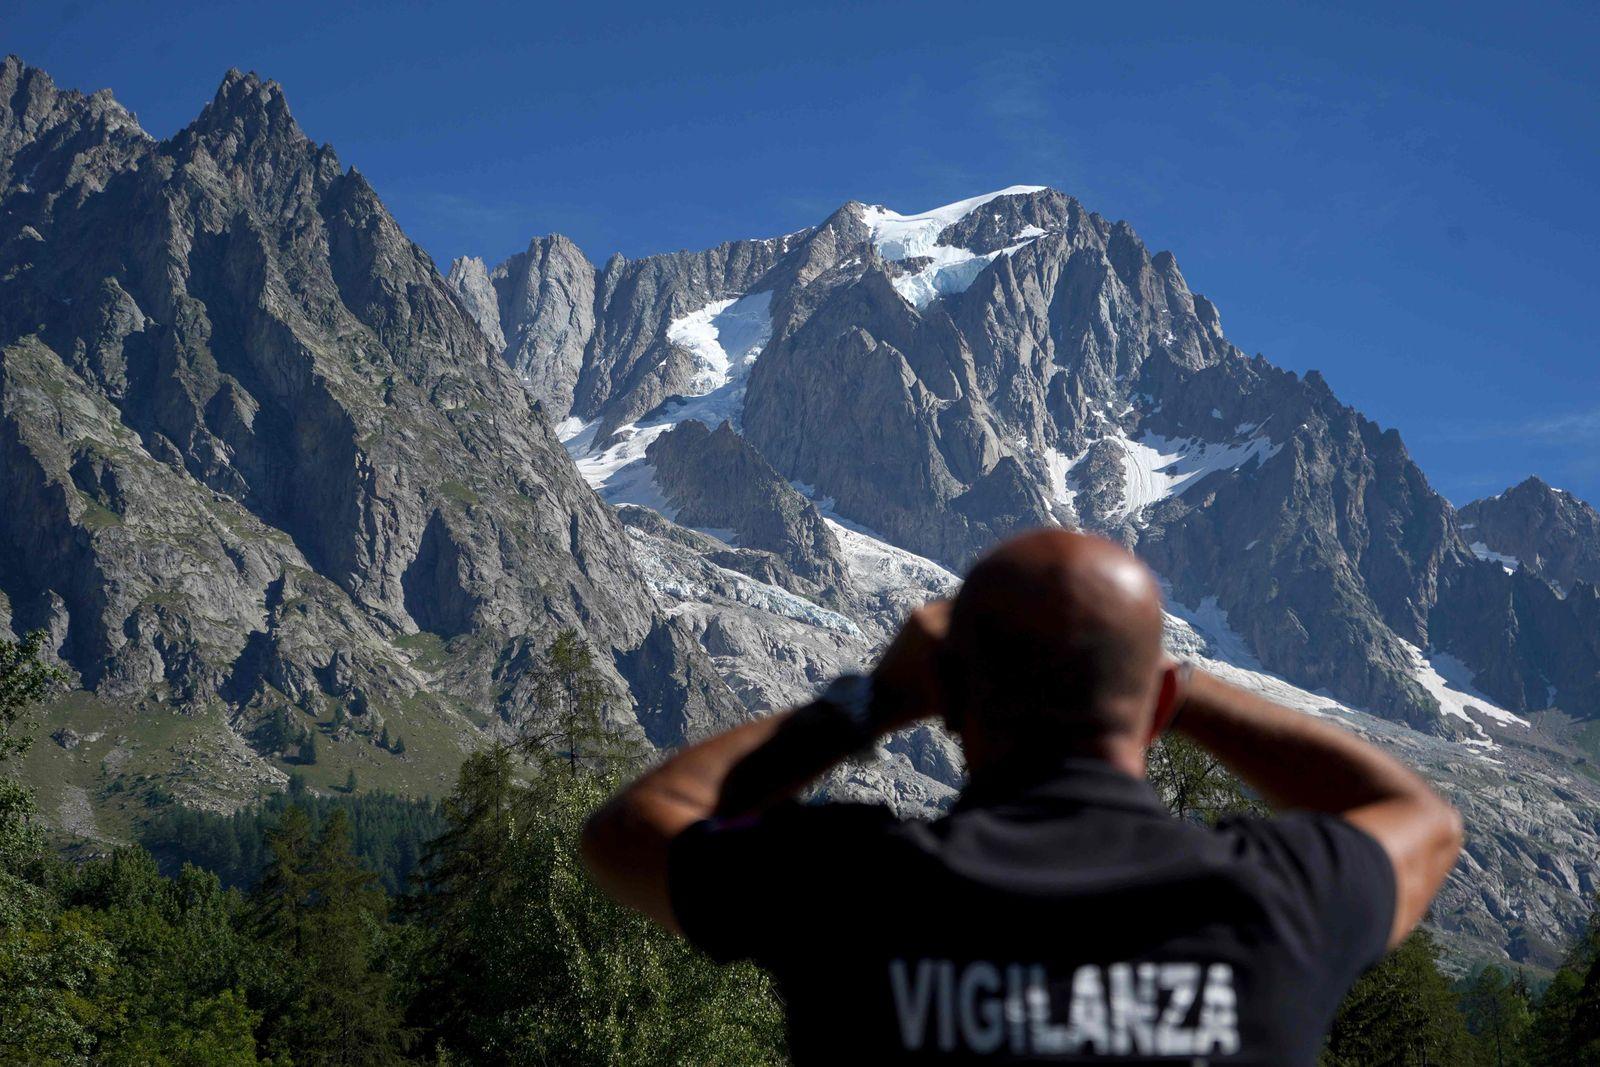 TOPSHOT-ITALY-GLACIER-ENVIROMENT